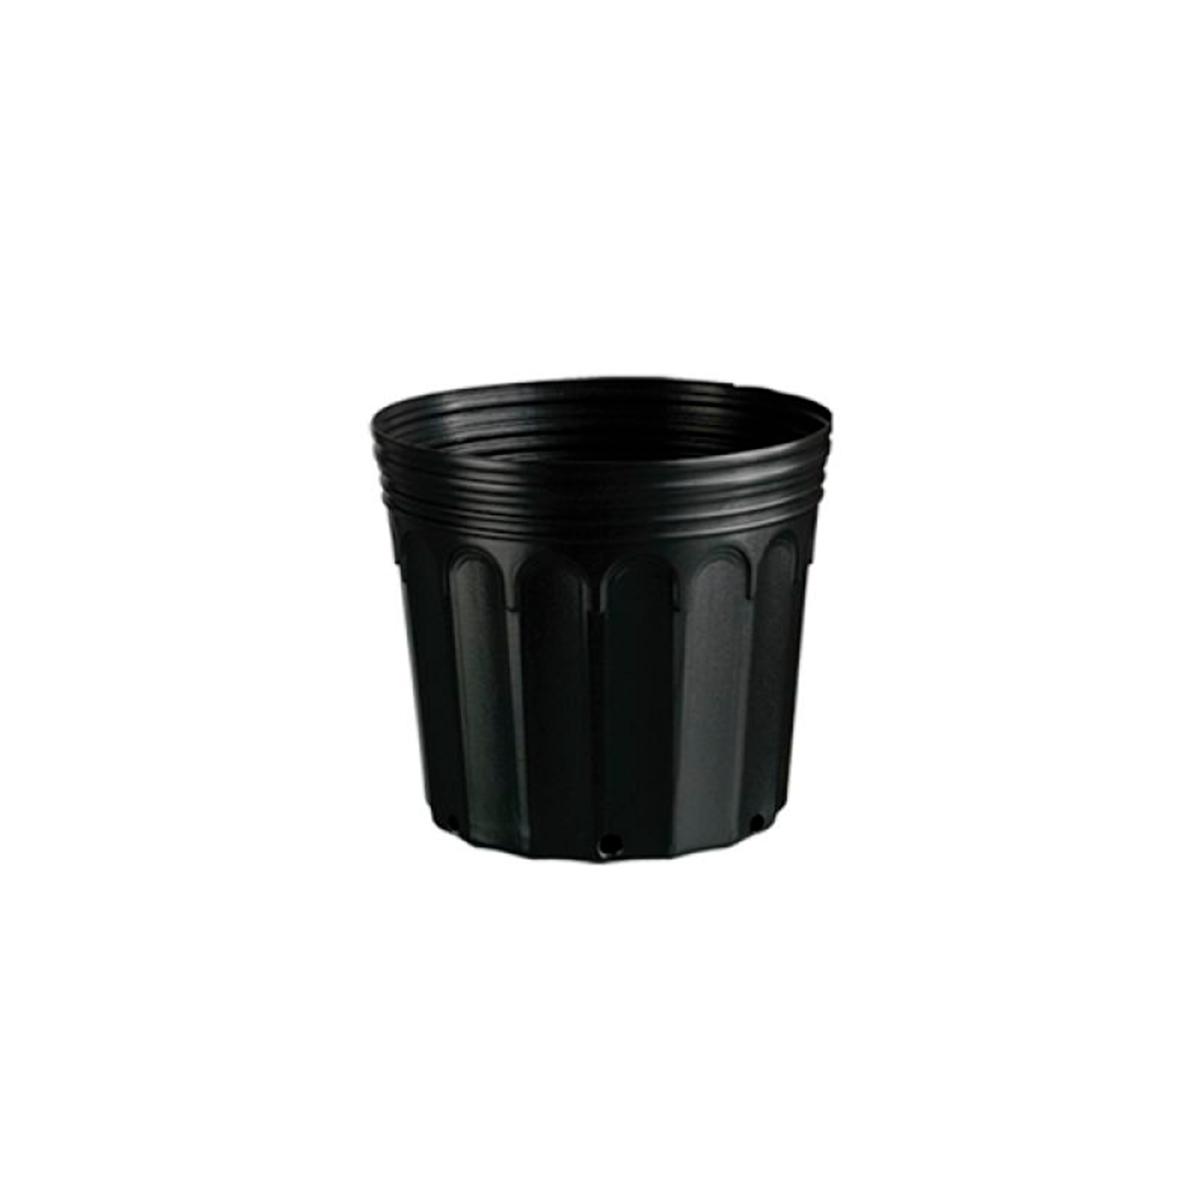 Kit 150 Embalagem para Mudas Flexível Plástico 8,5L